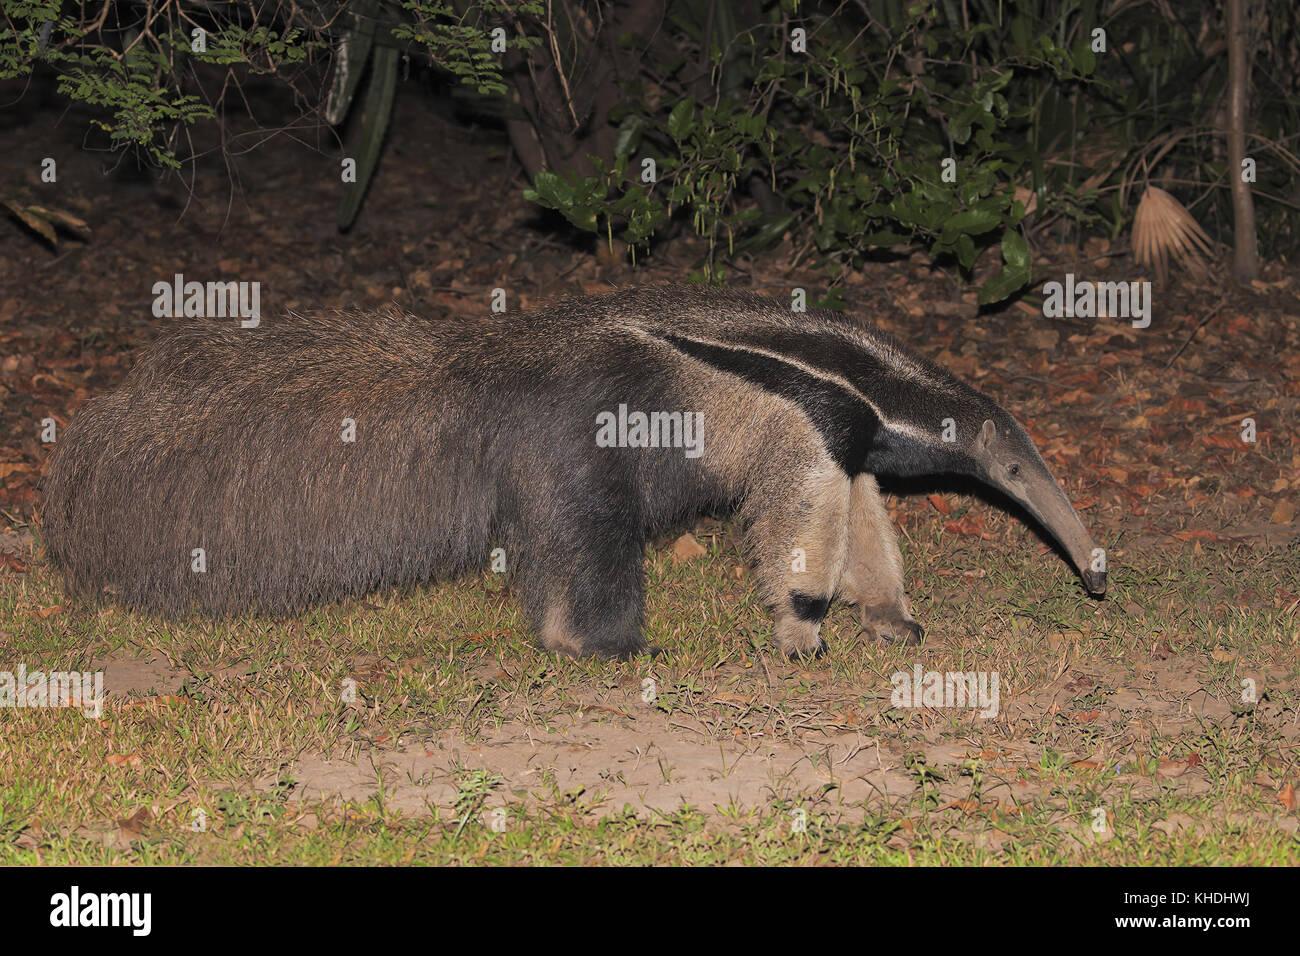 Giant Anteater - Stock Image